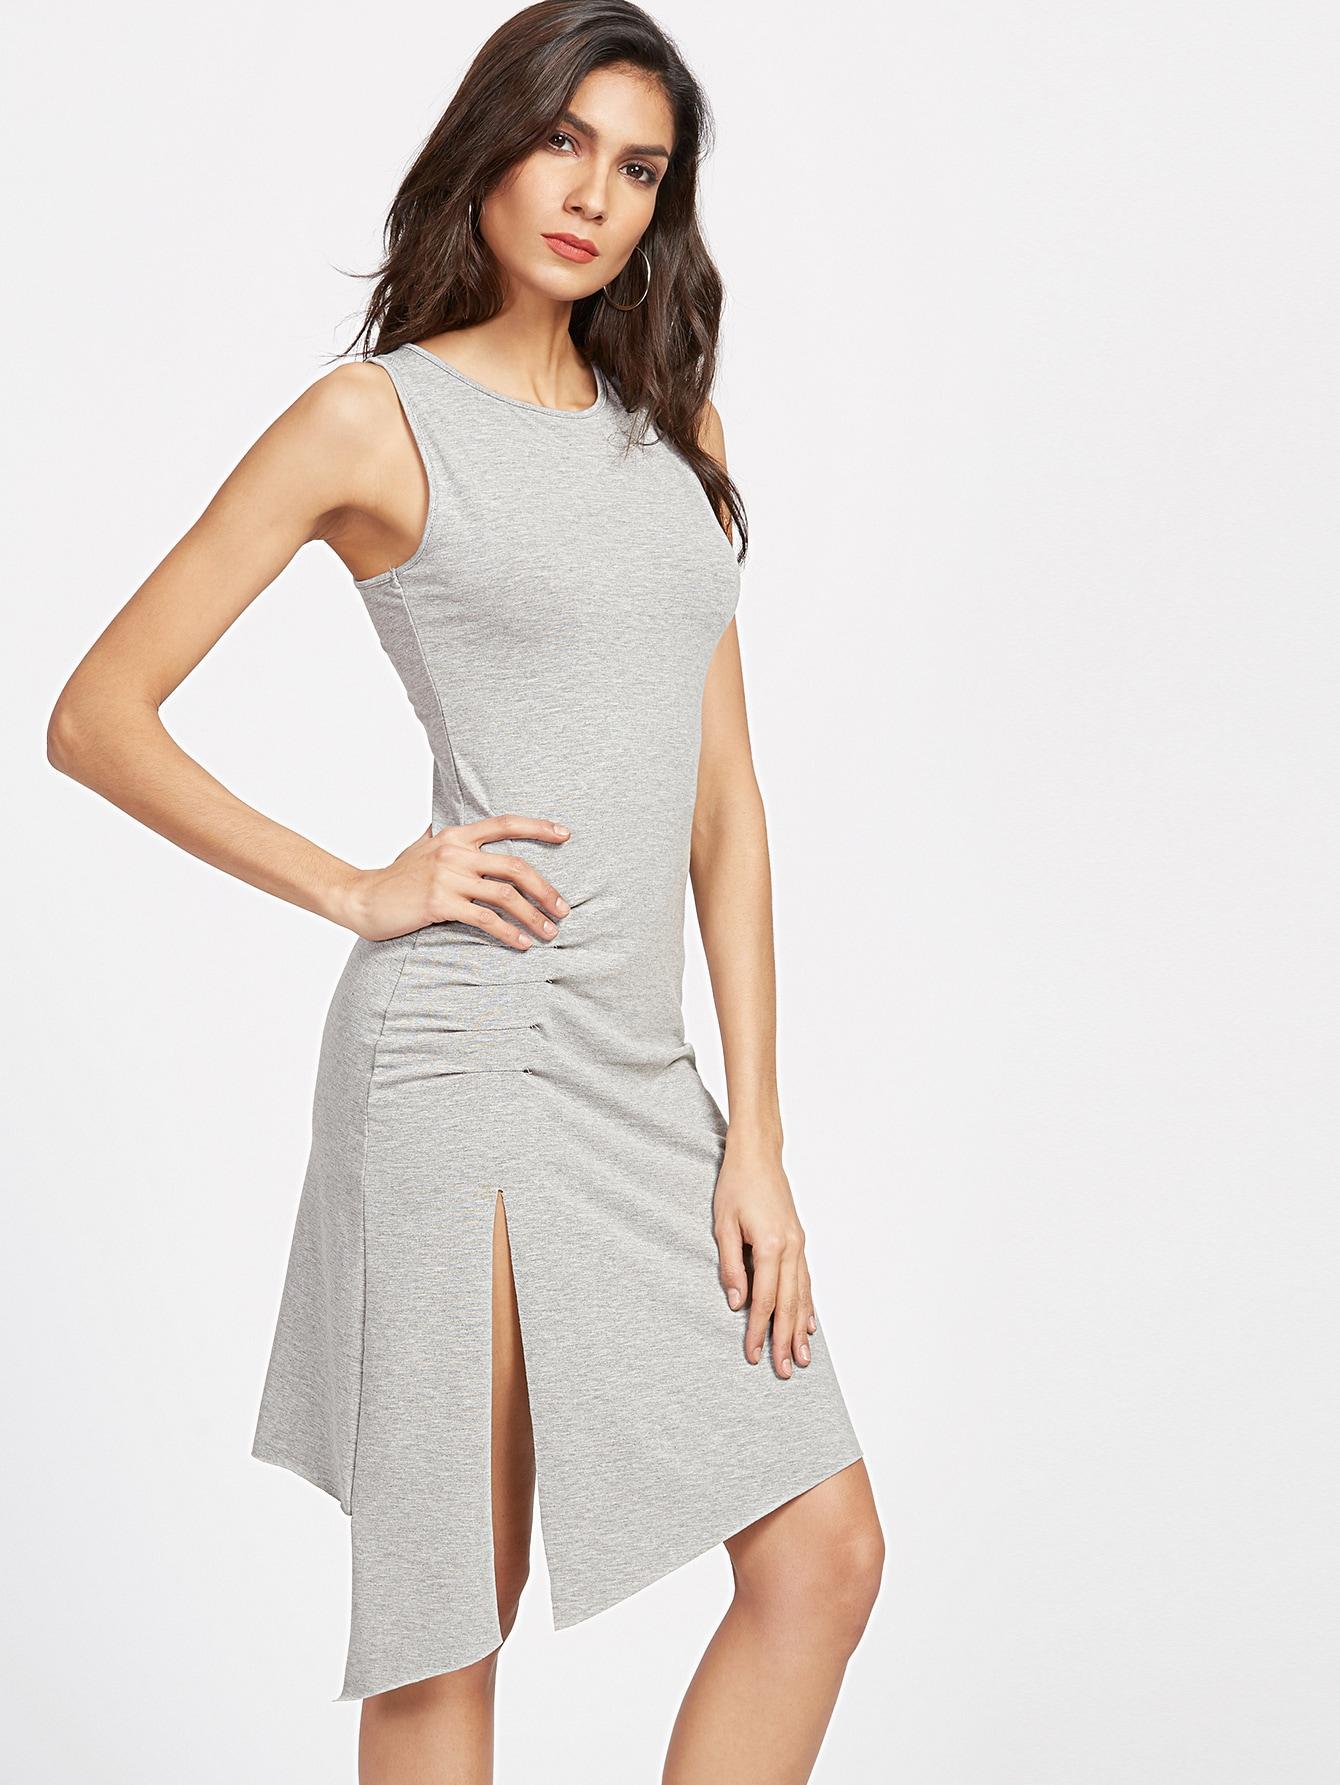 Grey Ruched Detail Split Side Asymmetrical Dress dress170315202